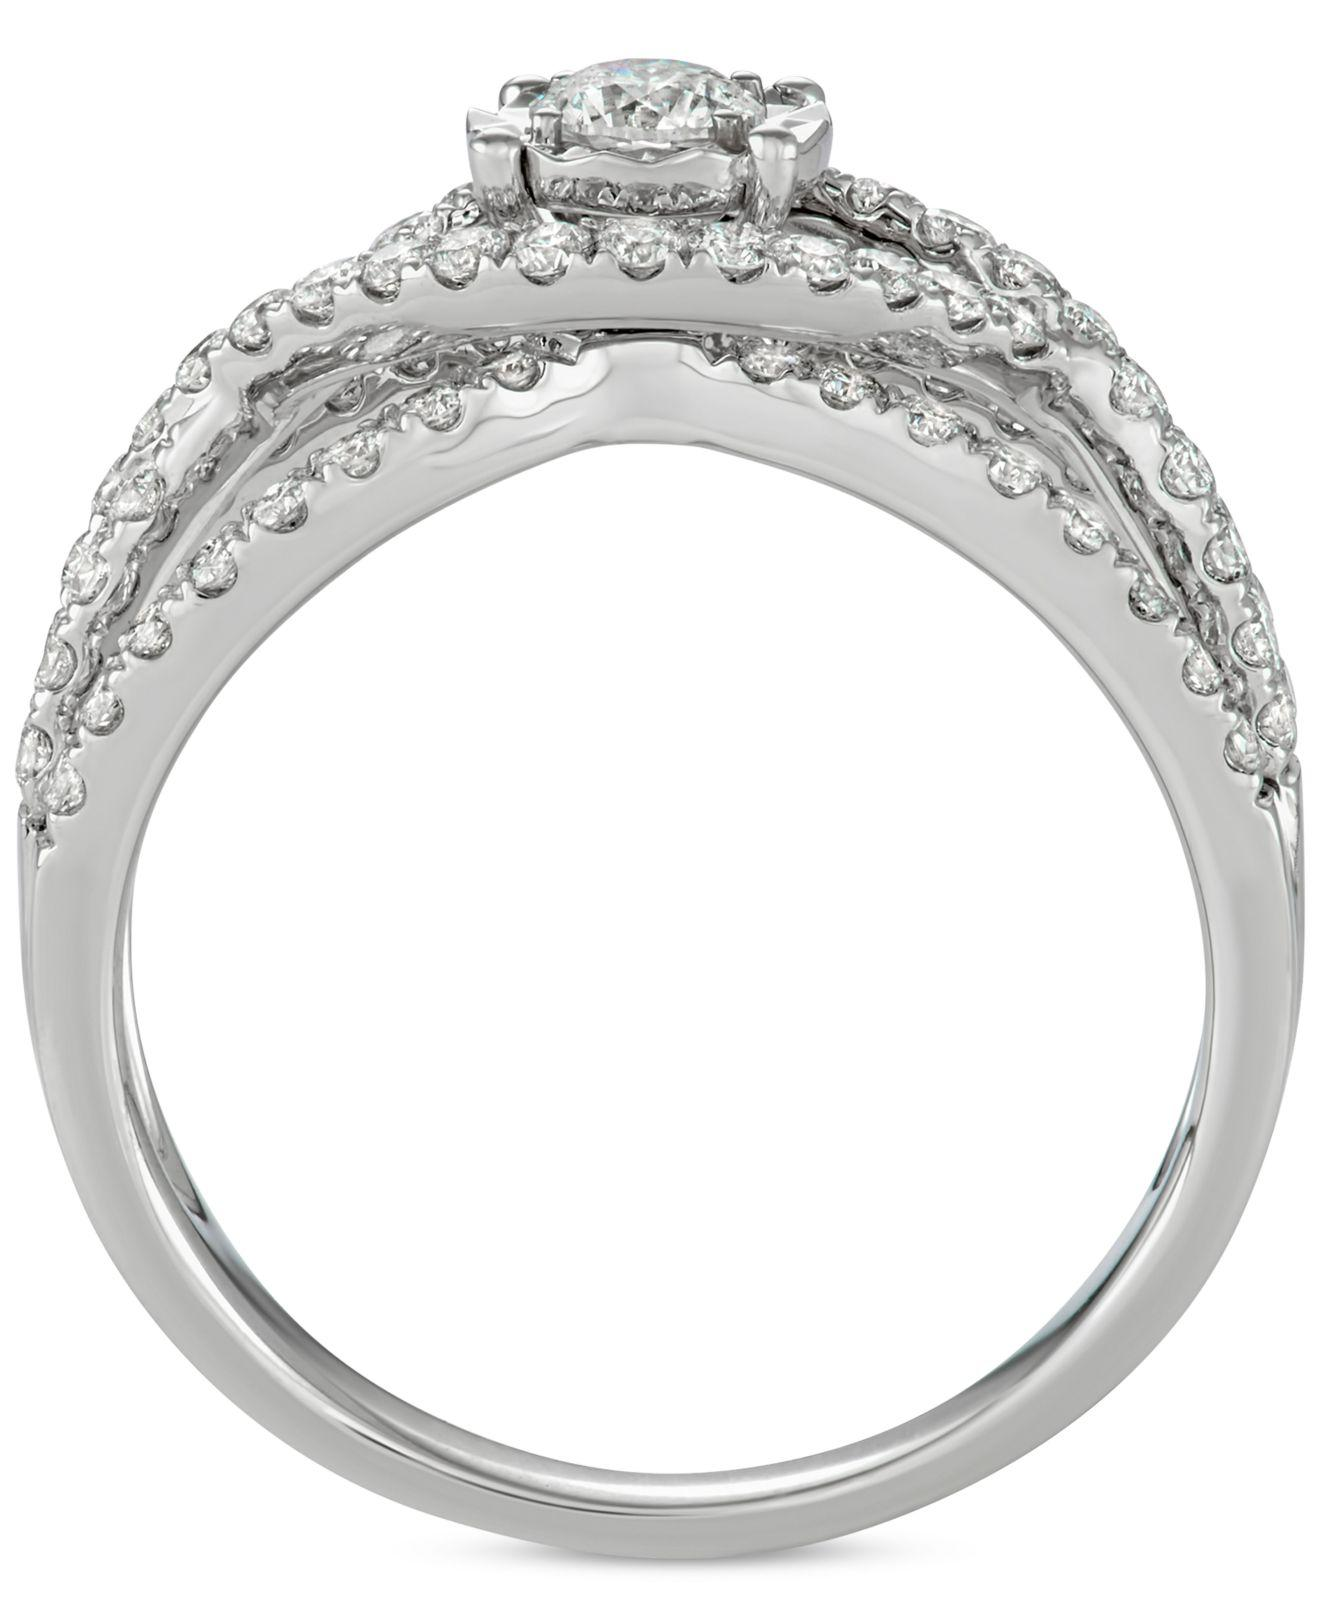 Macy s Diamond Weave Bridal Set 1 1 7 Ct T w In 14k White Gold